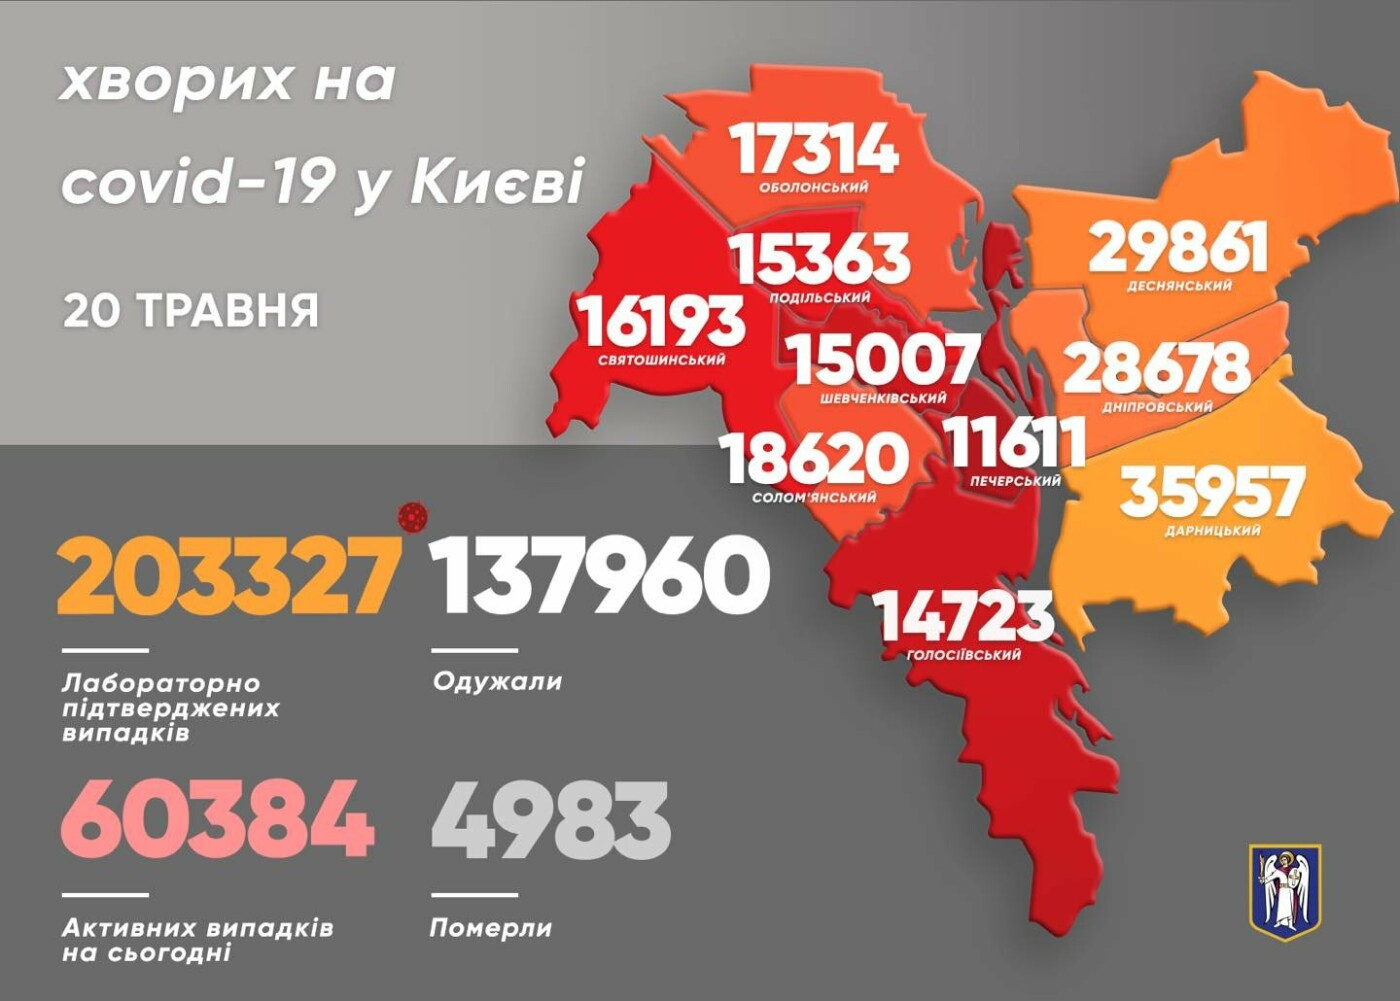 коронавирус новости красноярск статистика по районам